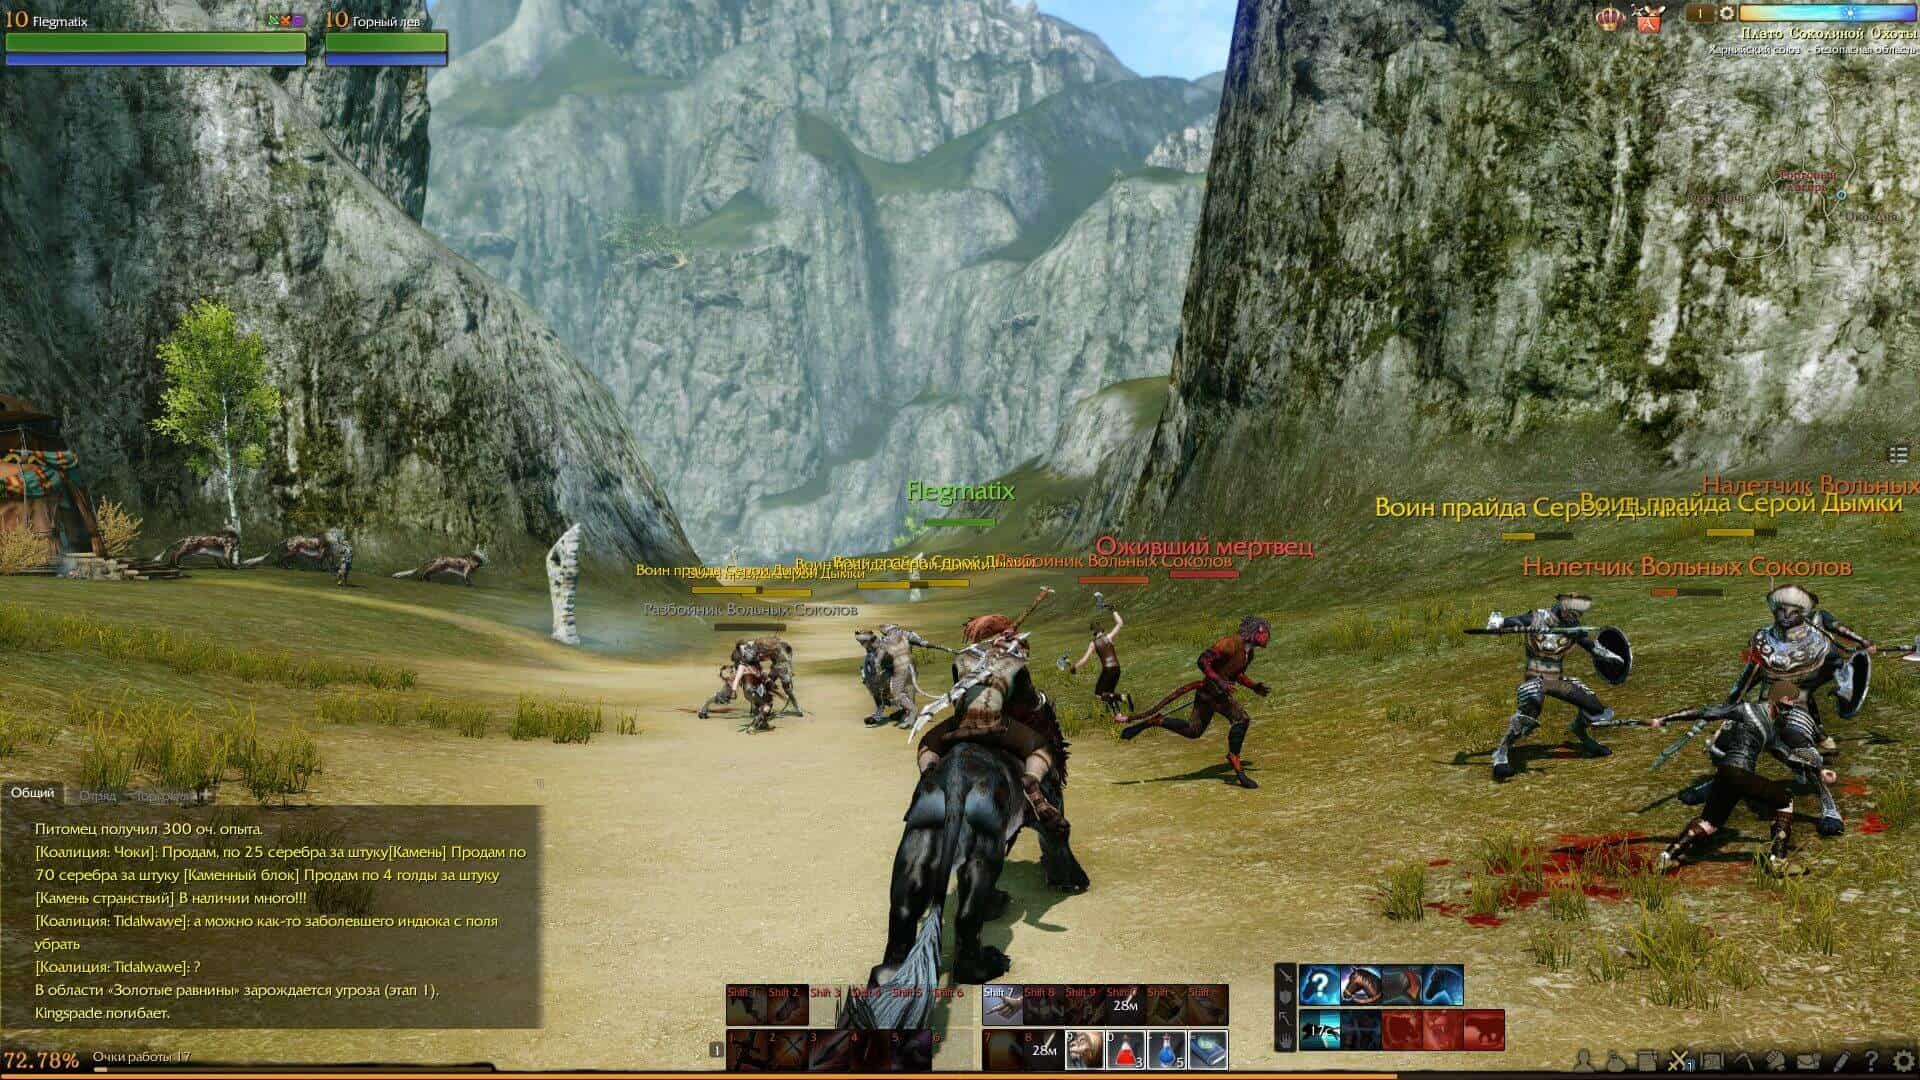 ArcheAge релиз DLC для корее